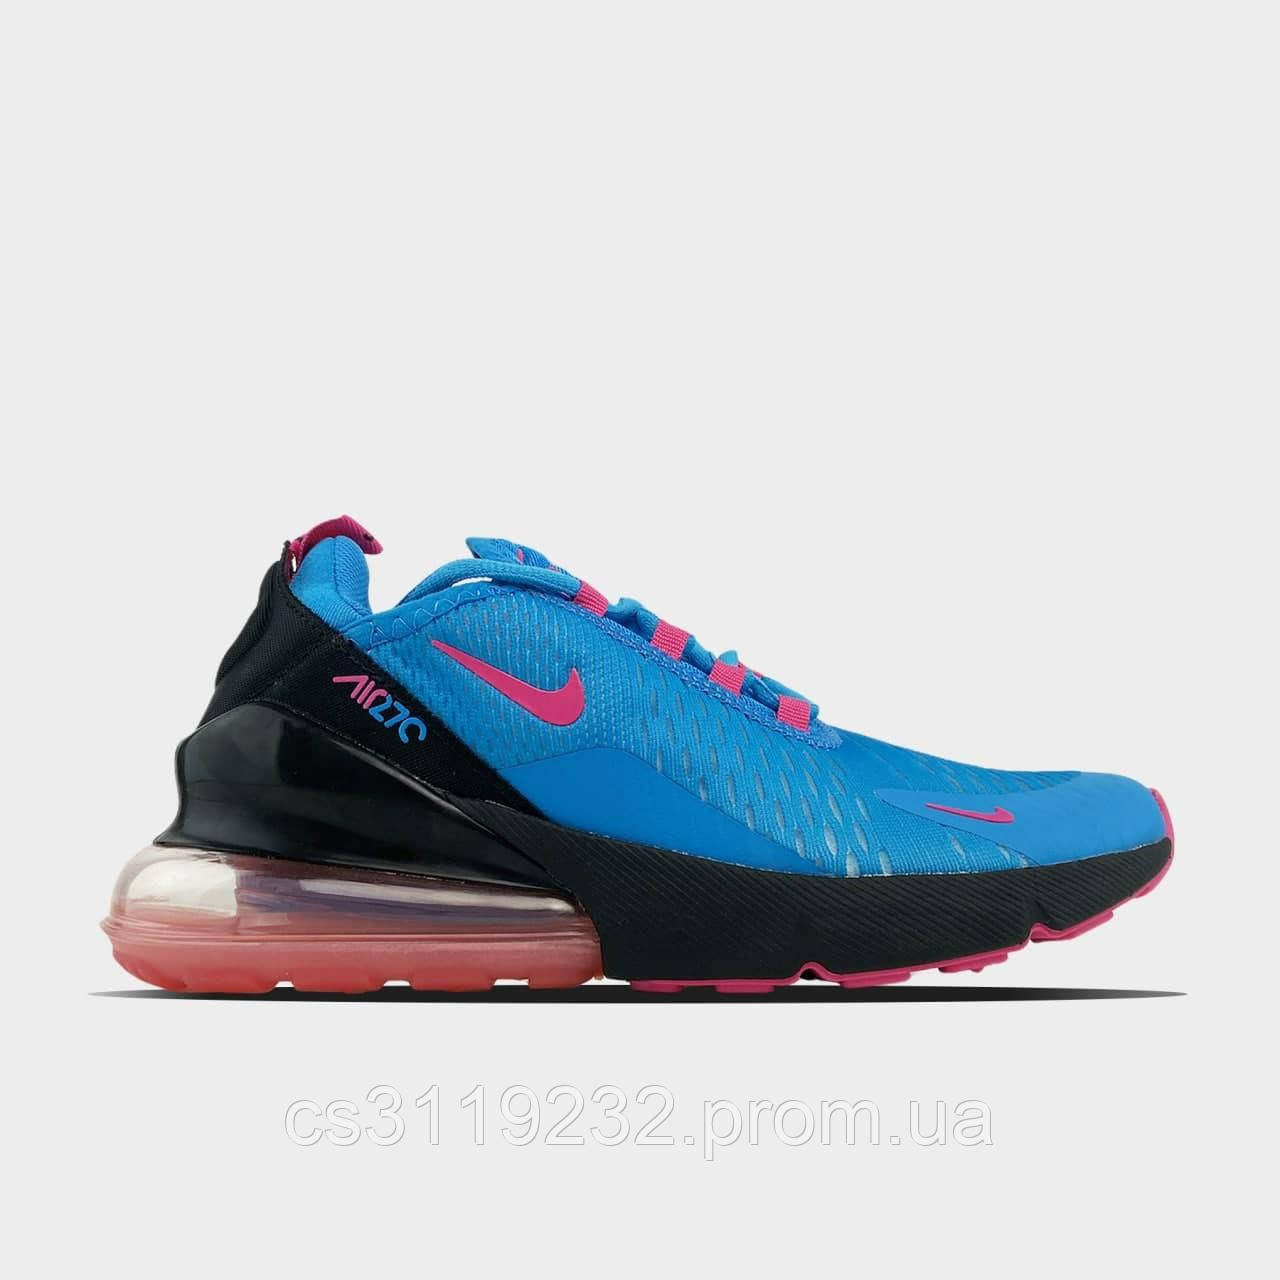 Мужские кроссовки Nike Air Max 270 South Beach (голубой)